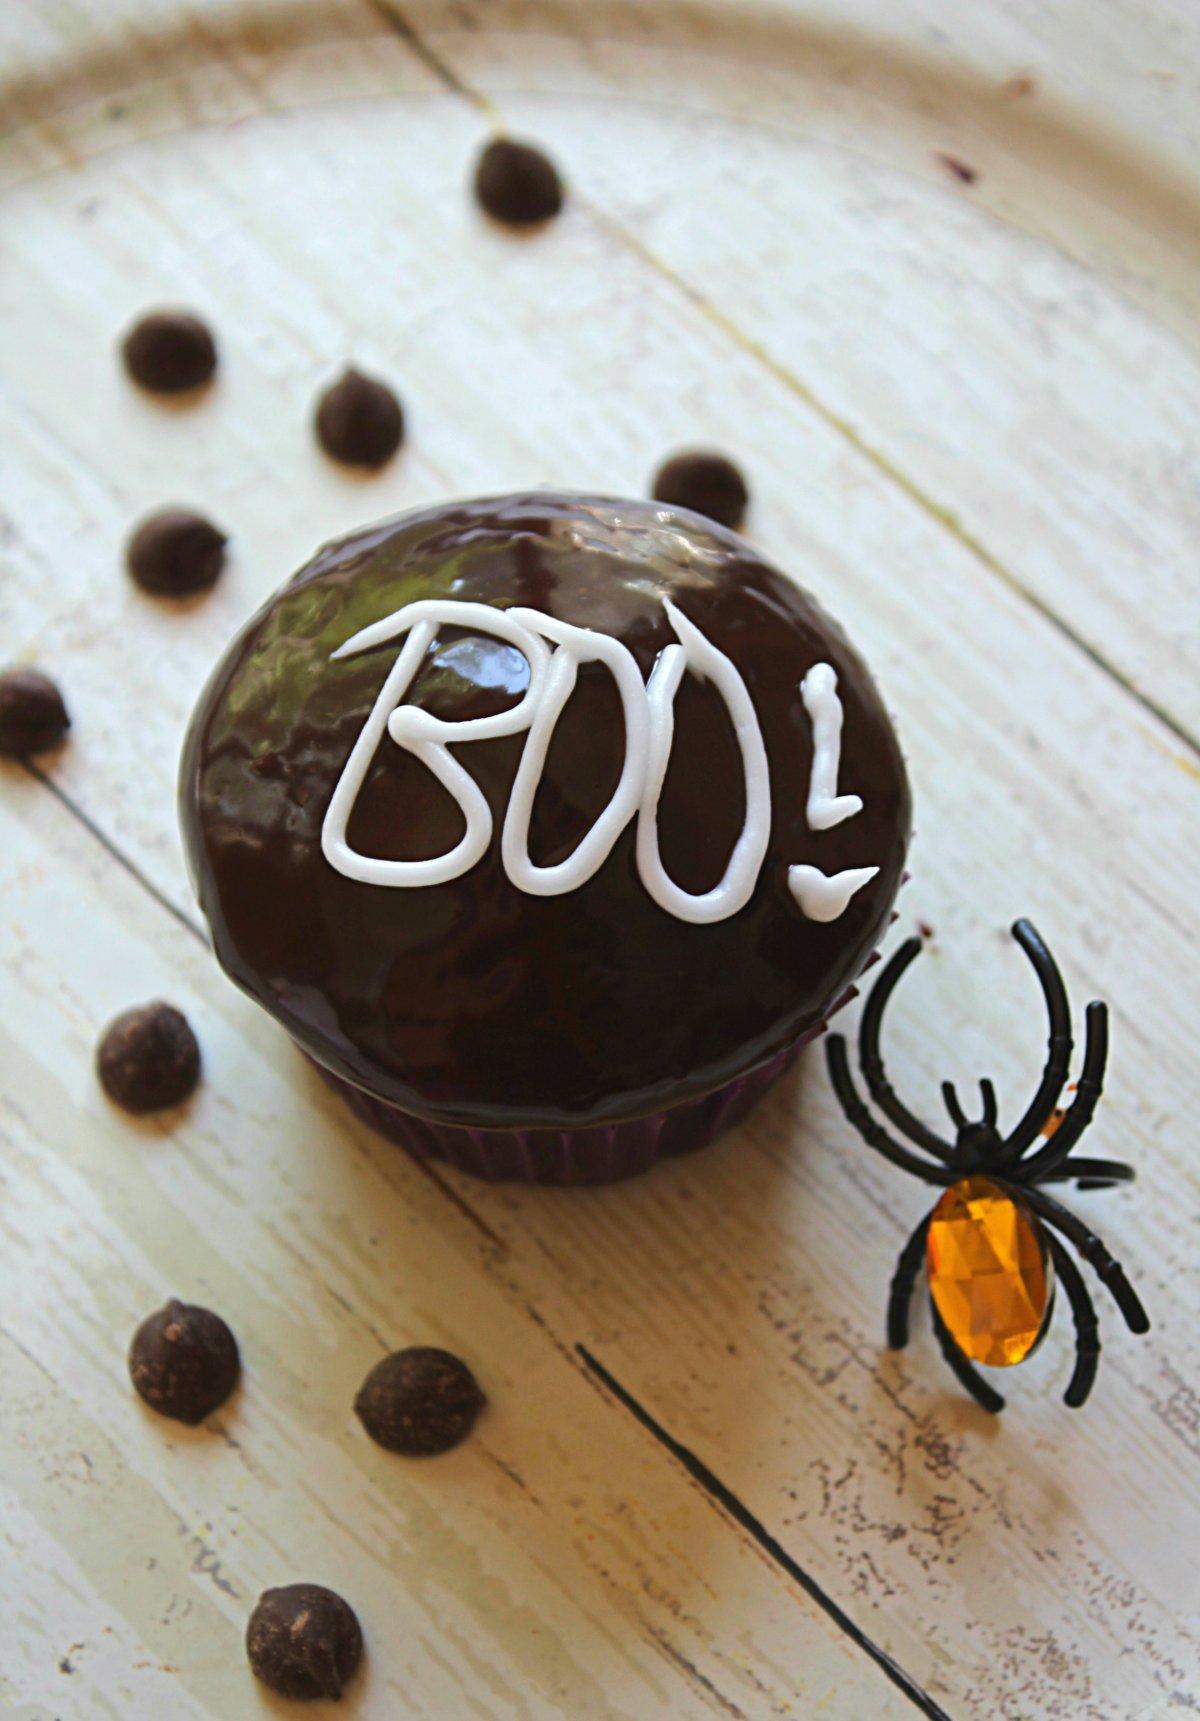 Super simple 'BOO!' chocolate ganache glazed Halloween cupcakes